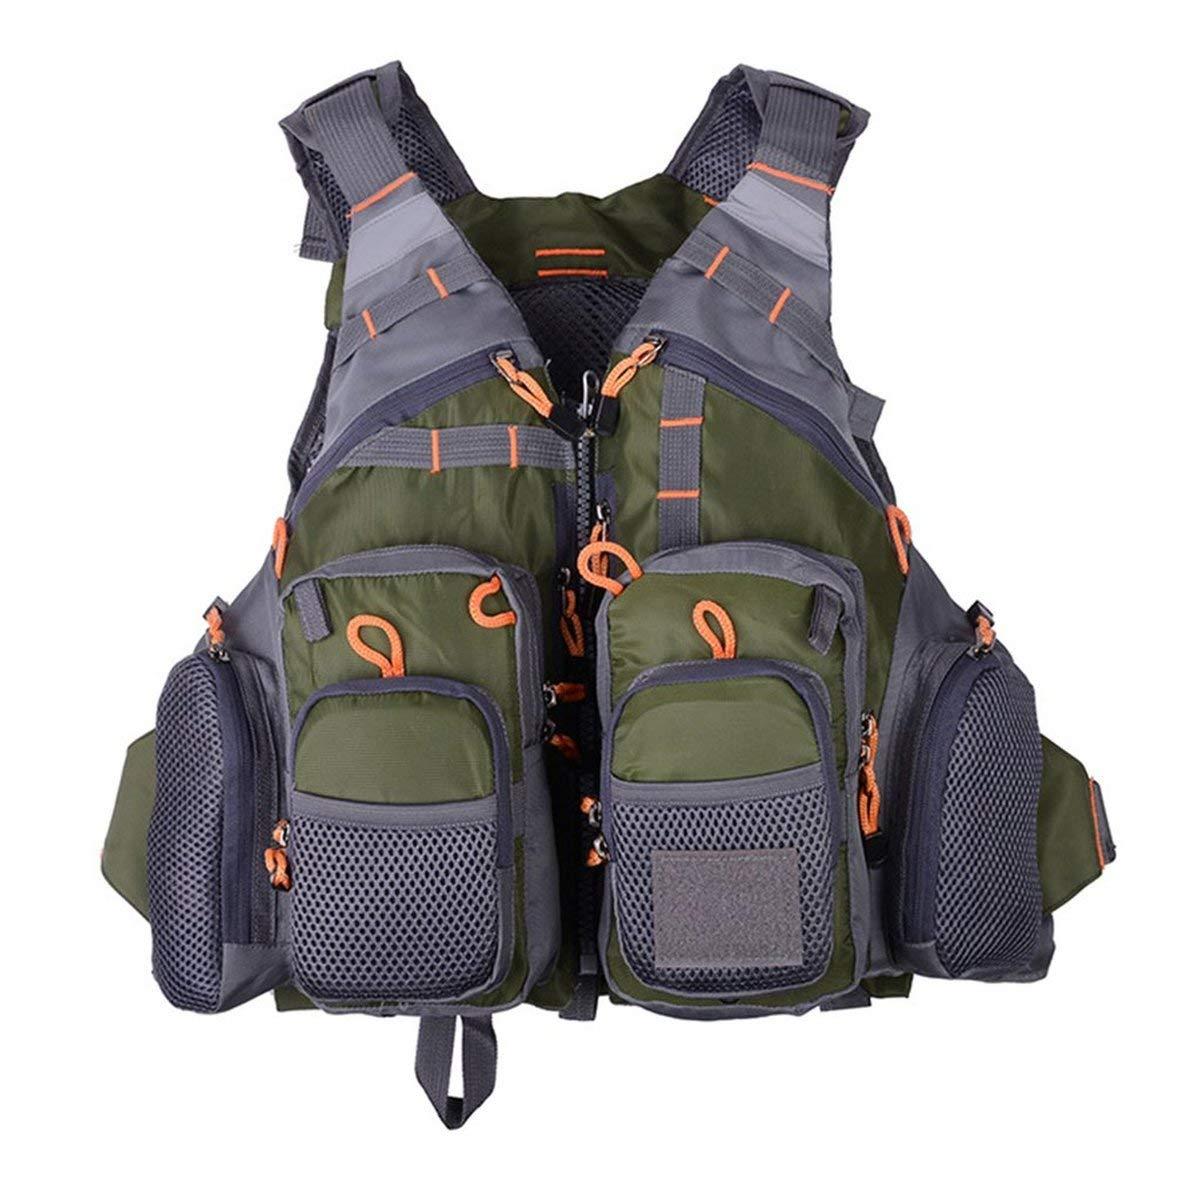 Moliies Komfortable multifunktionale Outdoor Angeln schnell trocknende Mesh Angeln Weste Mutil-Taschen Abnehmbare Angeln Weste Jacke